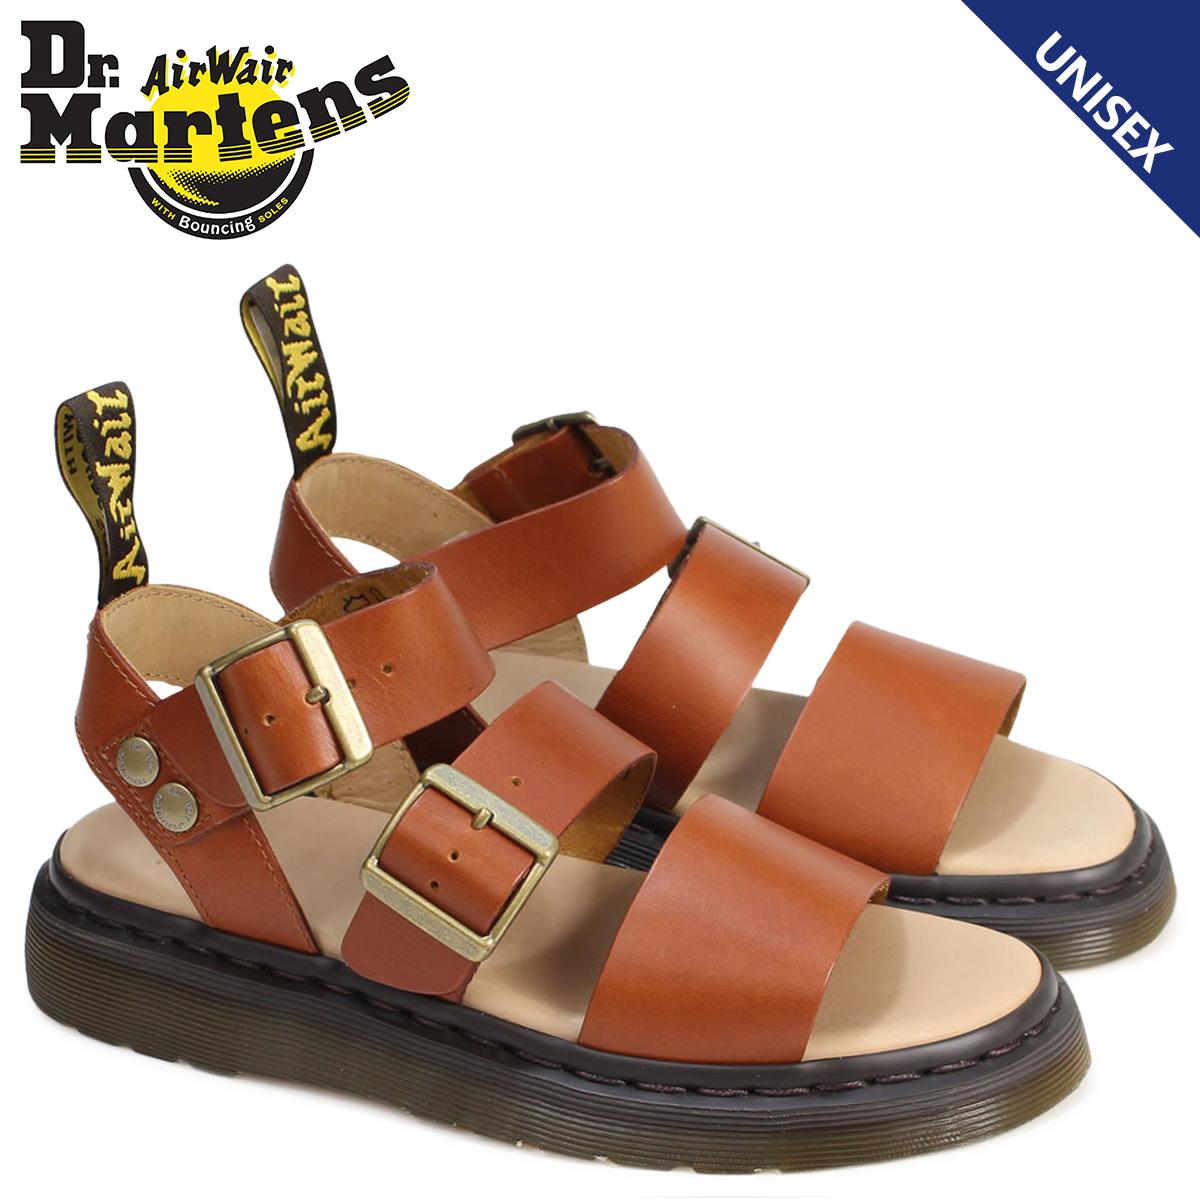 0840809a4115 SneaK Online Shop  Doctor Martin sandals Lady s men Dr.Martens ...